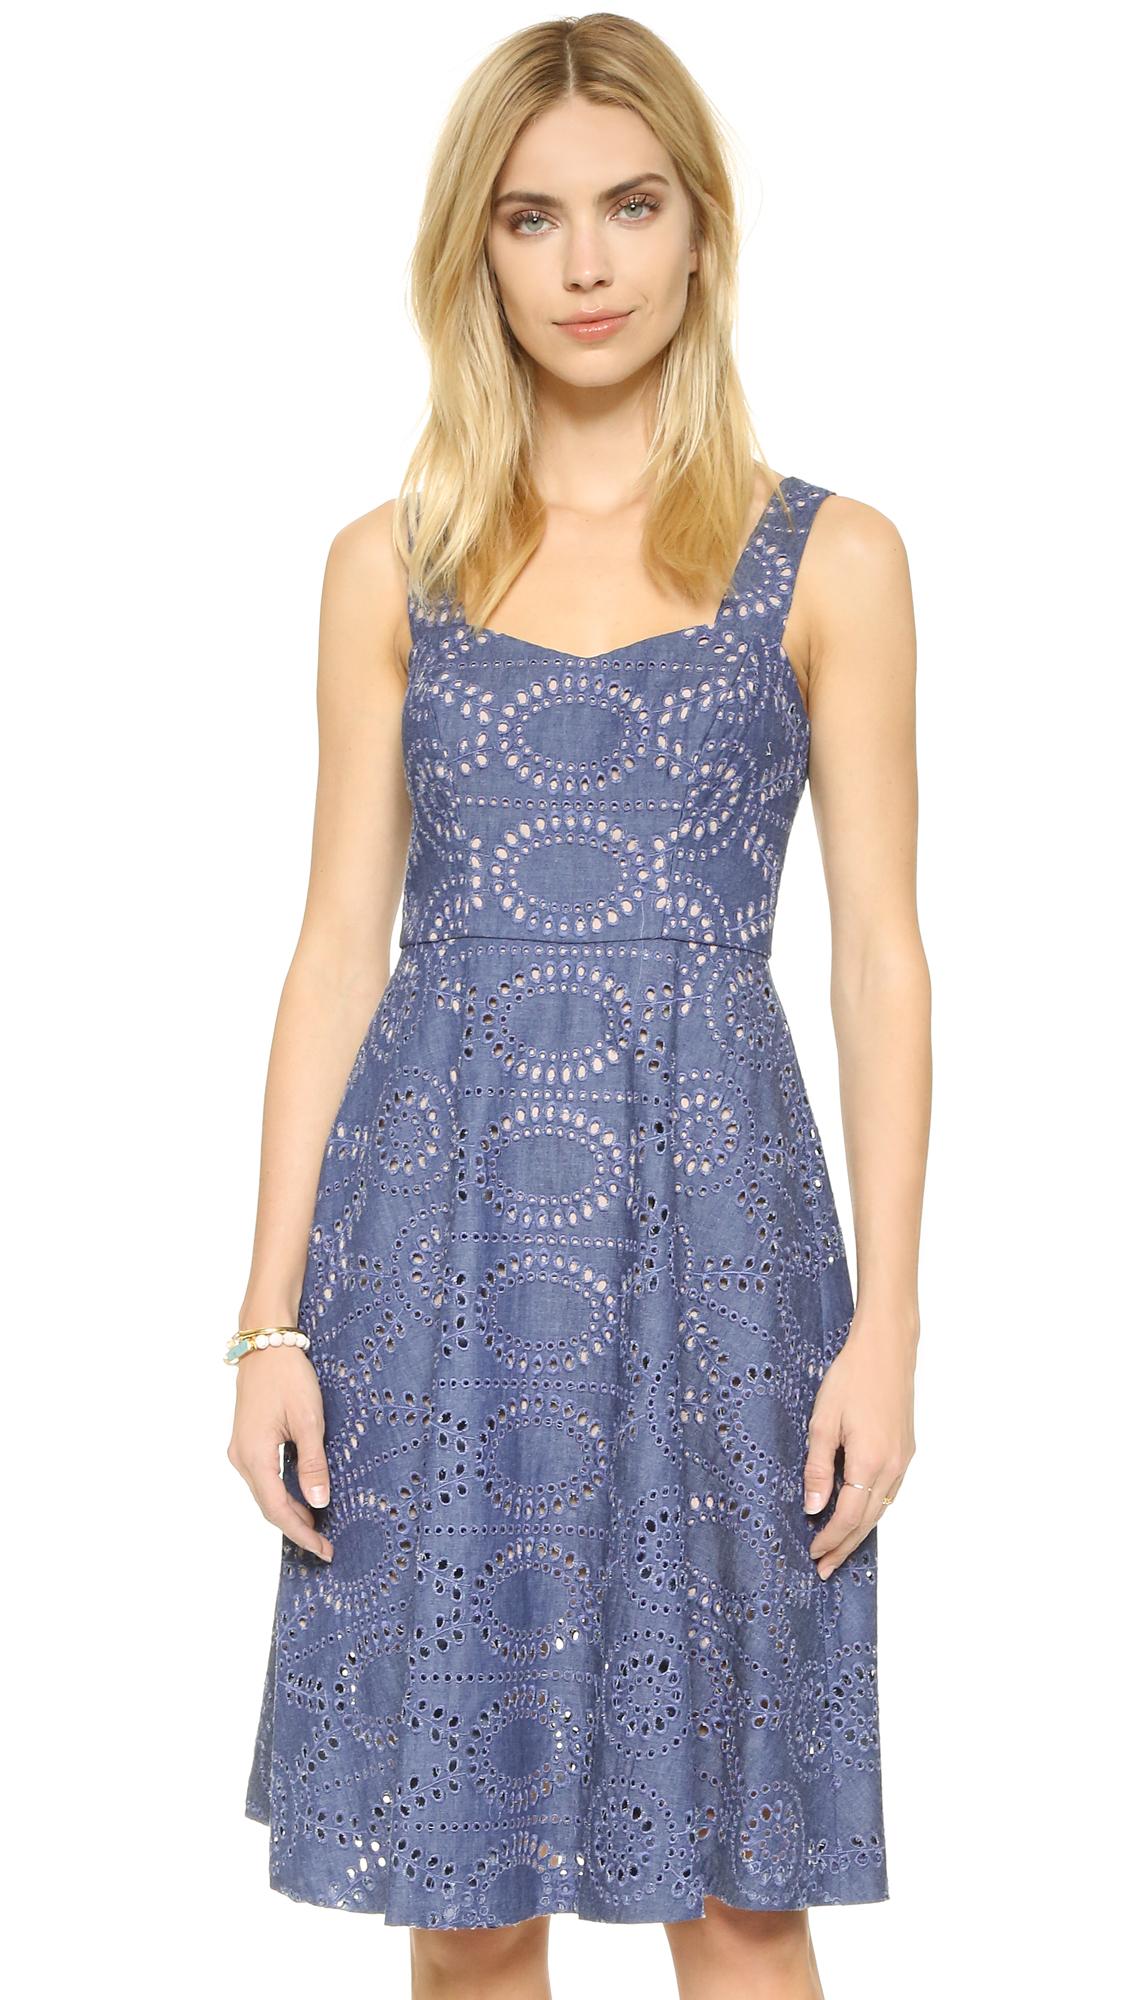 Lyst Shoshanna Reese Eyelet Dress In Blue